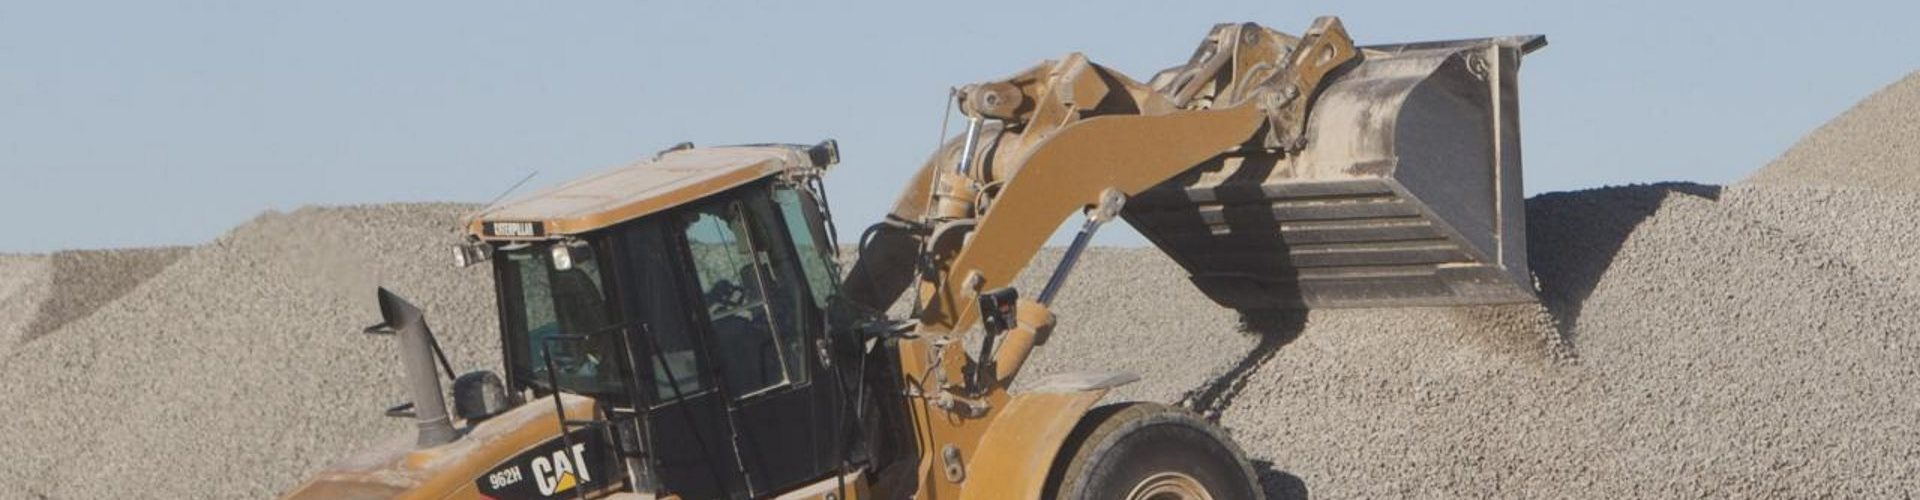 Bulldozer, chargeuse sur pneus